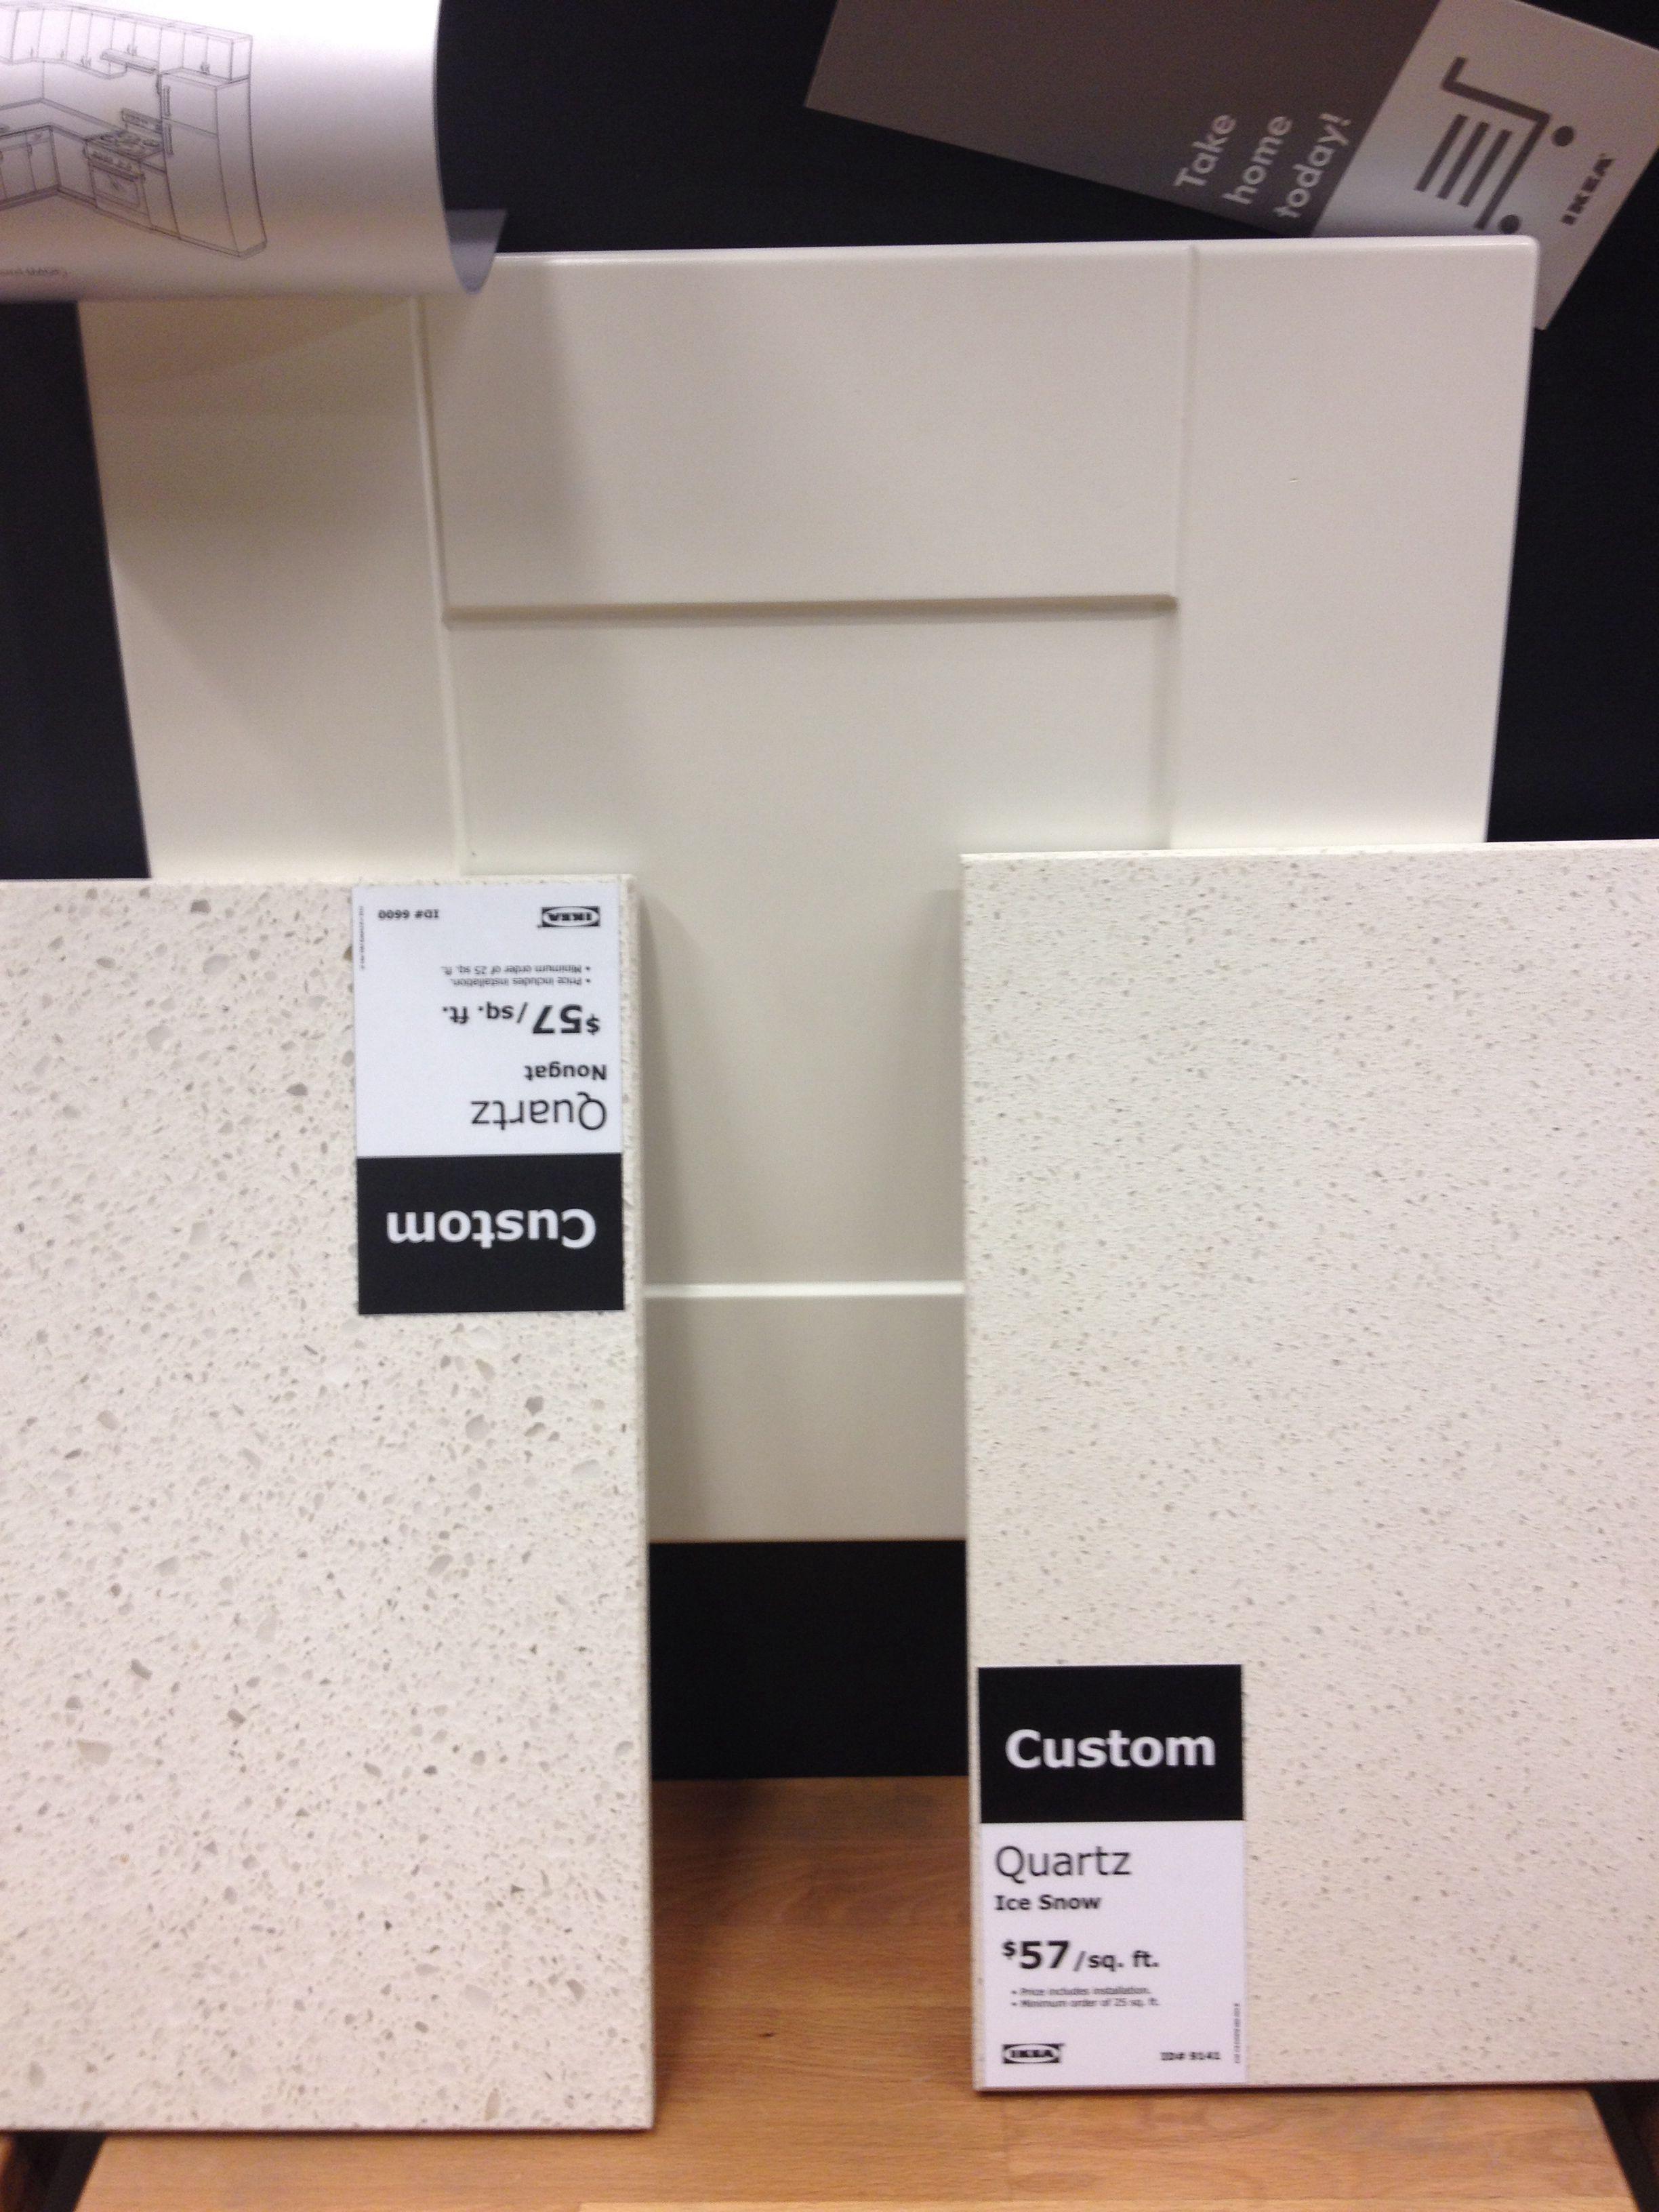 Ikea Adel With Nougat And Ice Snow Quartz House Pinterest